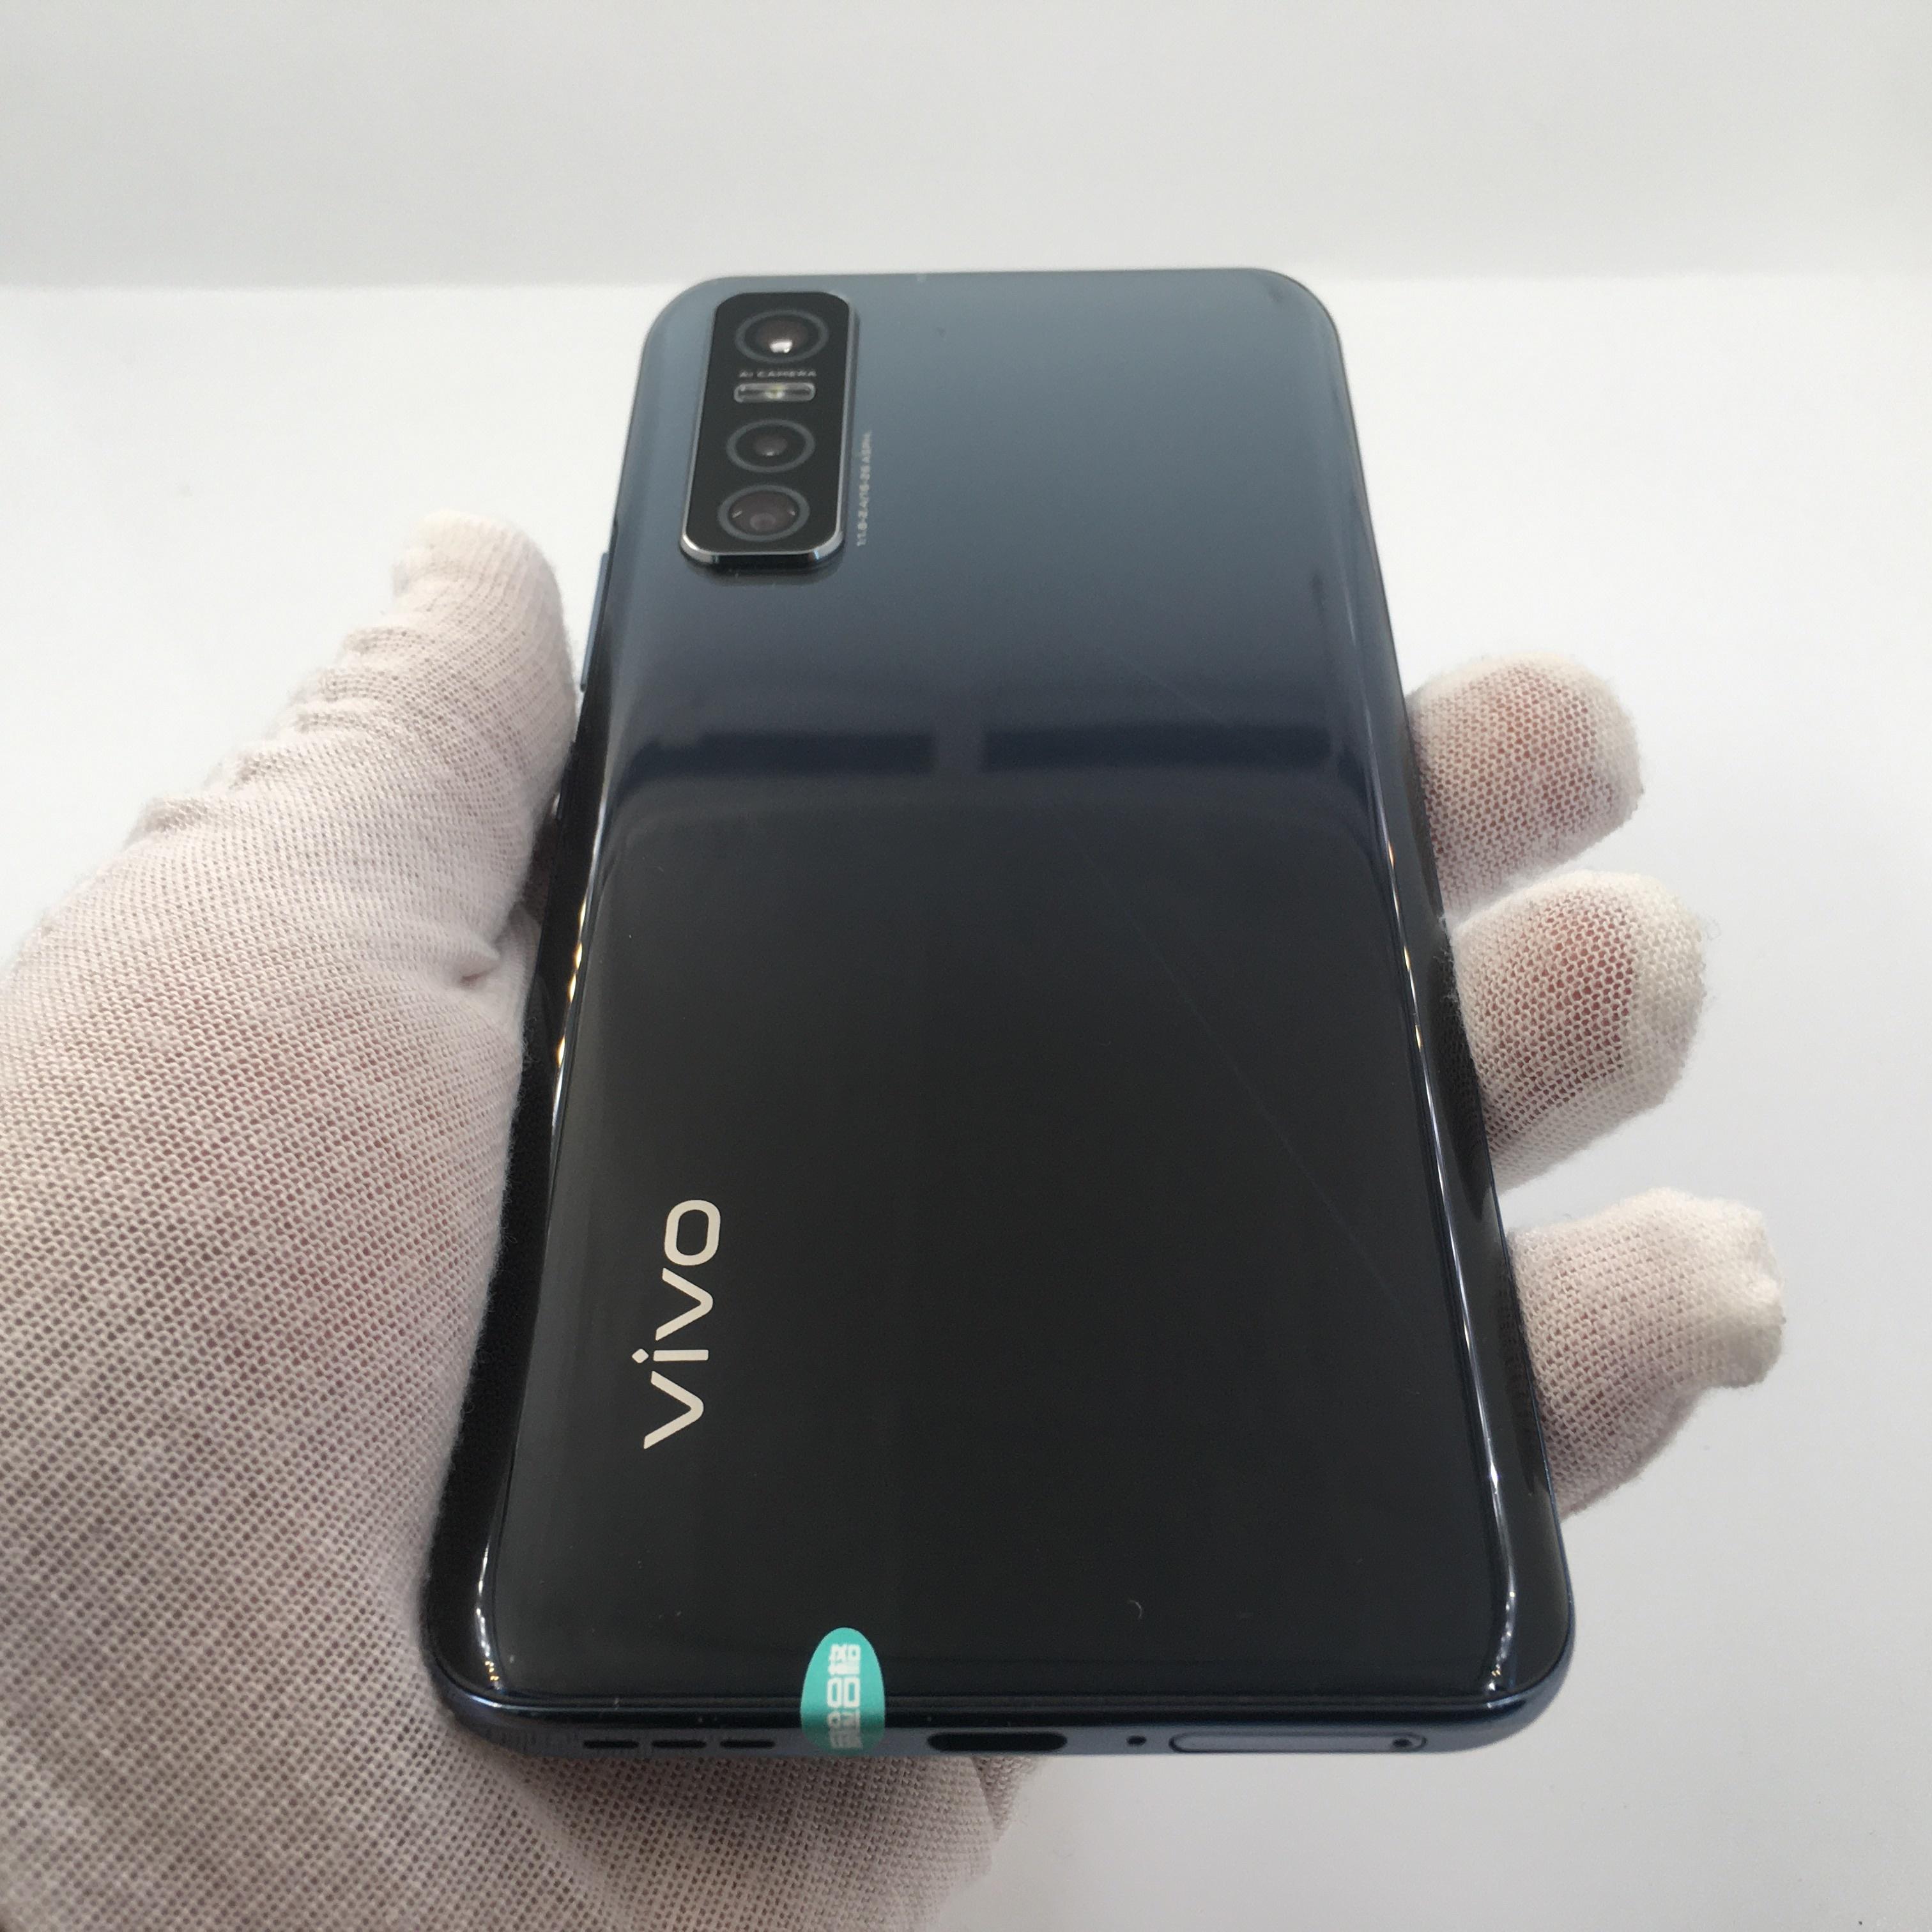 vivo【Y73s】5G全网通 黑镜 8G/128G 国行 95新